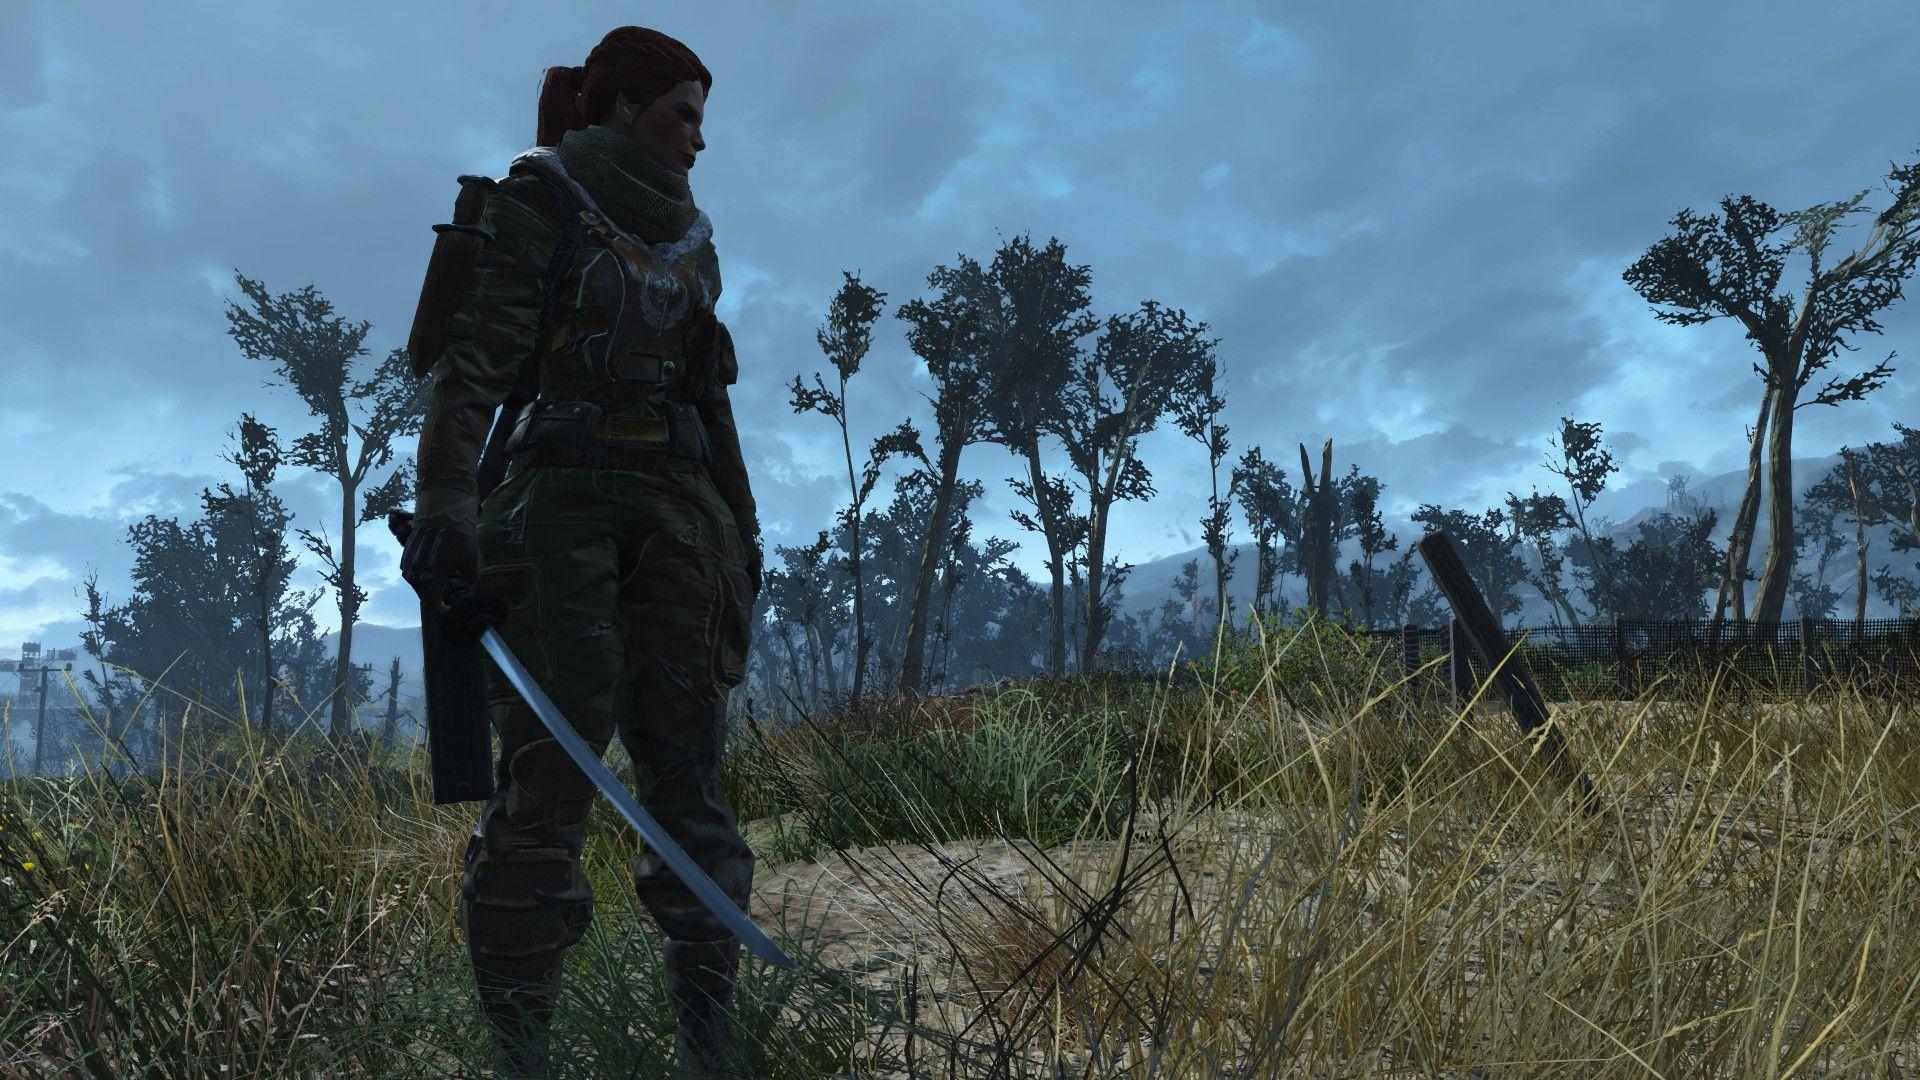 I like Cait better as a wasteland samurai #Fallout4 #gaming #Fallout